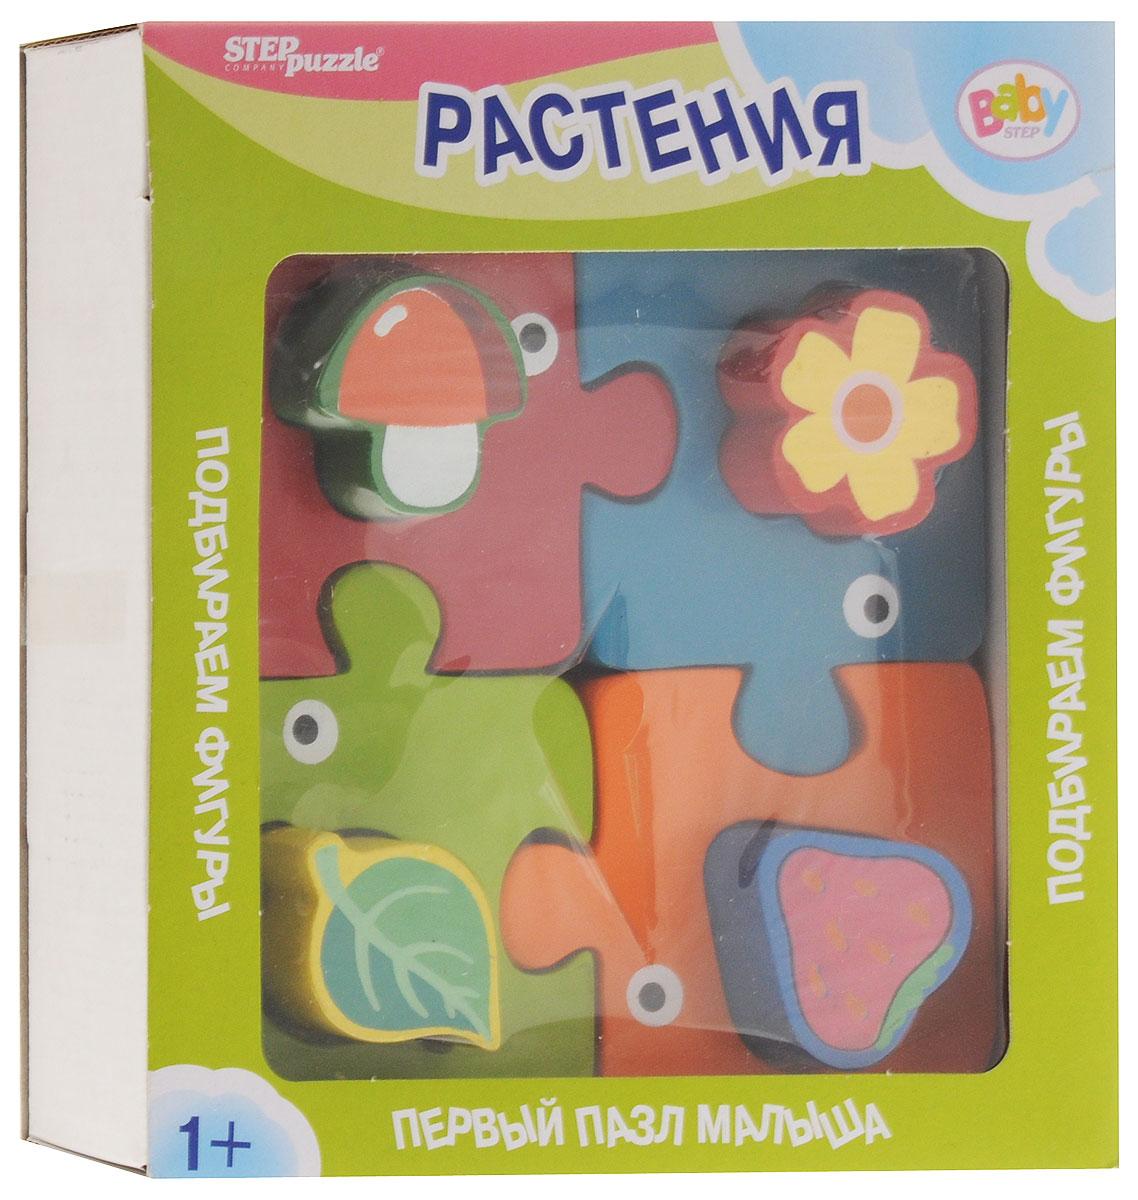 Step Puzzle Пазл для малышей Растения step puzzle пазл для малышей каруселька паровоз